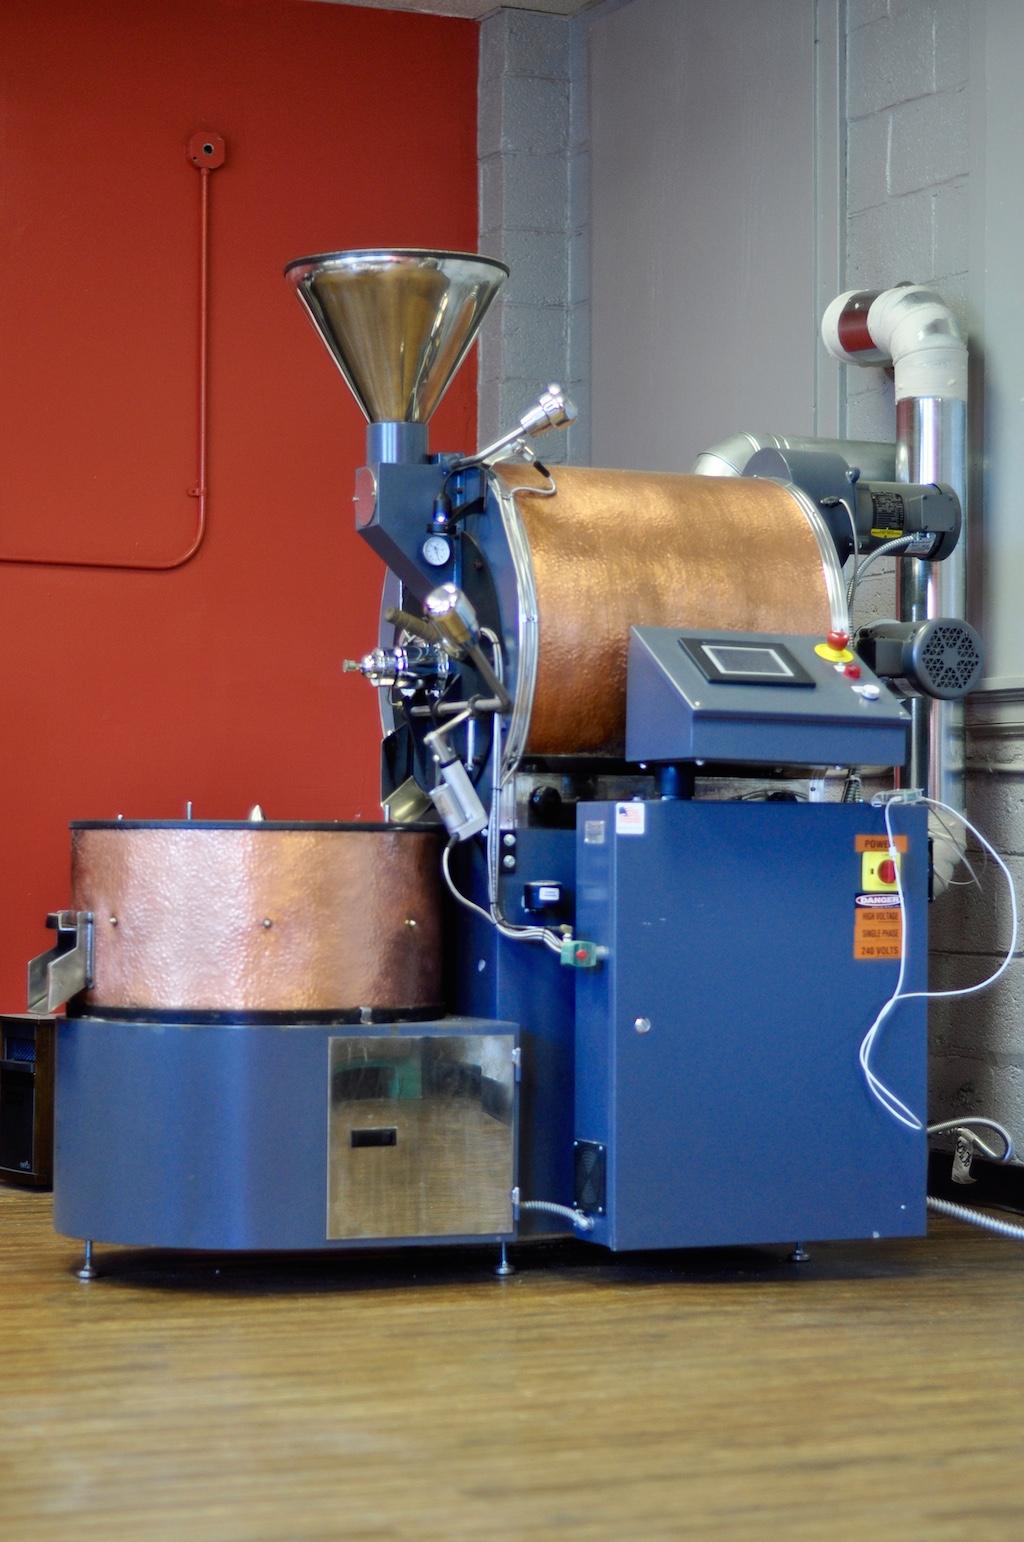 ironclad roaster